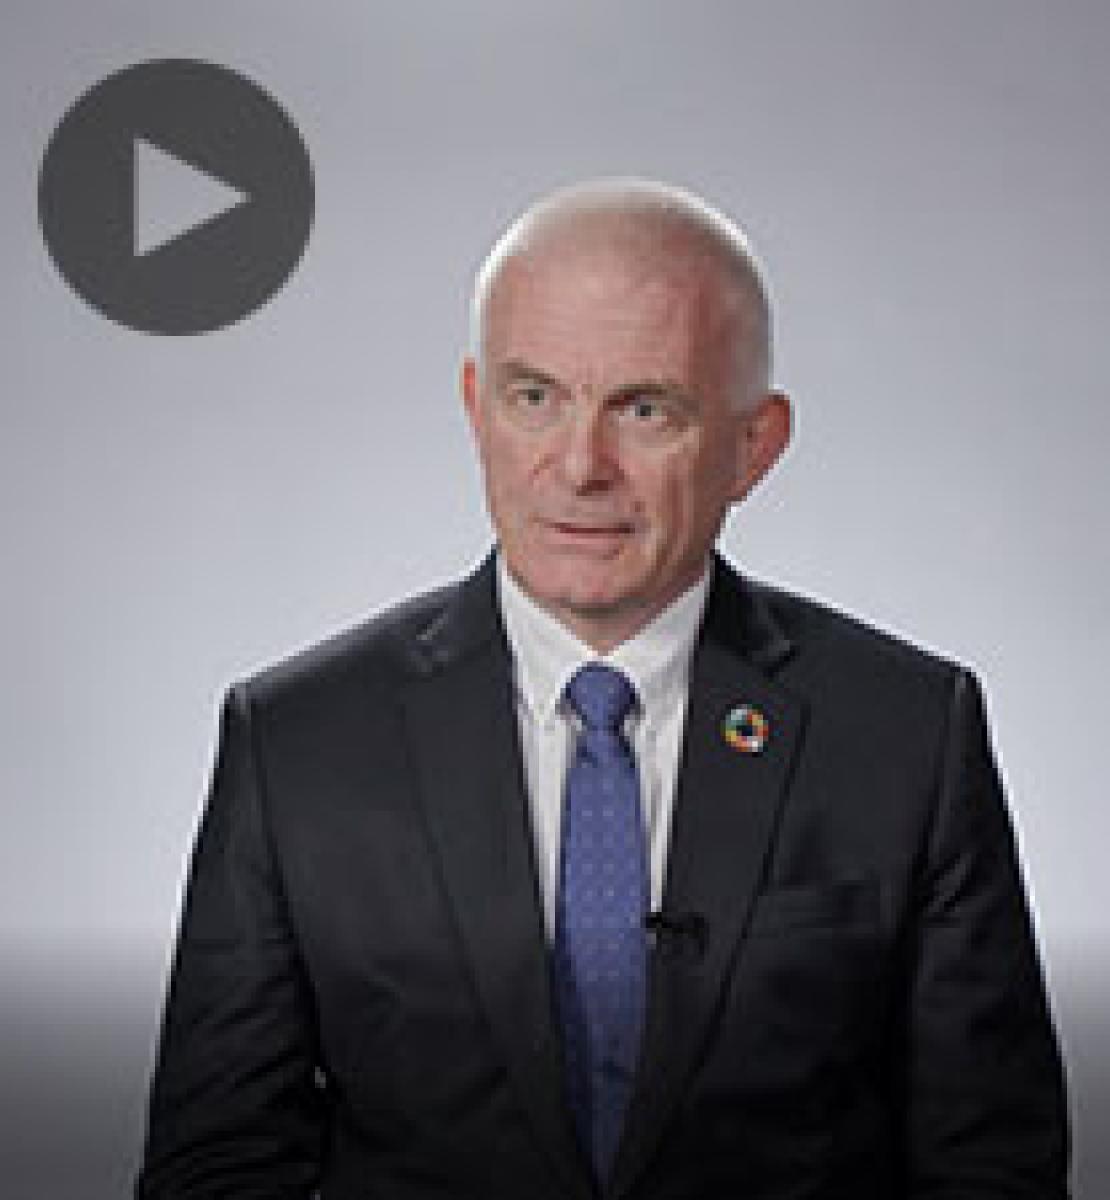 Screenshot from video message shows Resident Coordinator, Knut Ostby